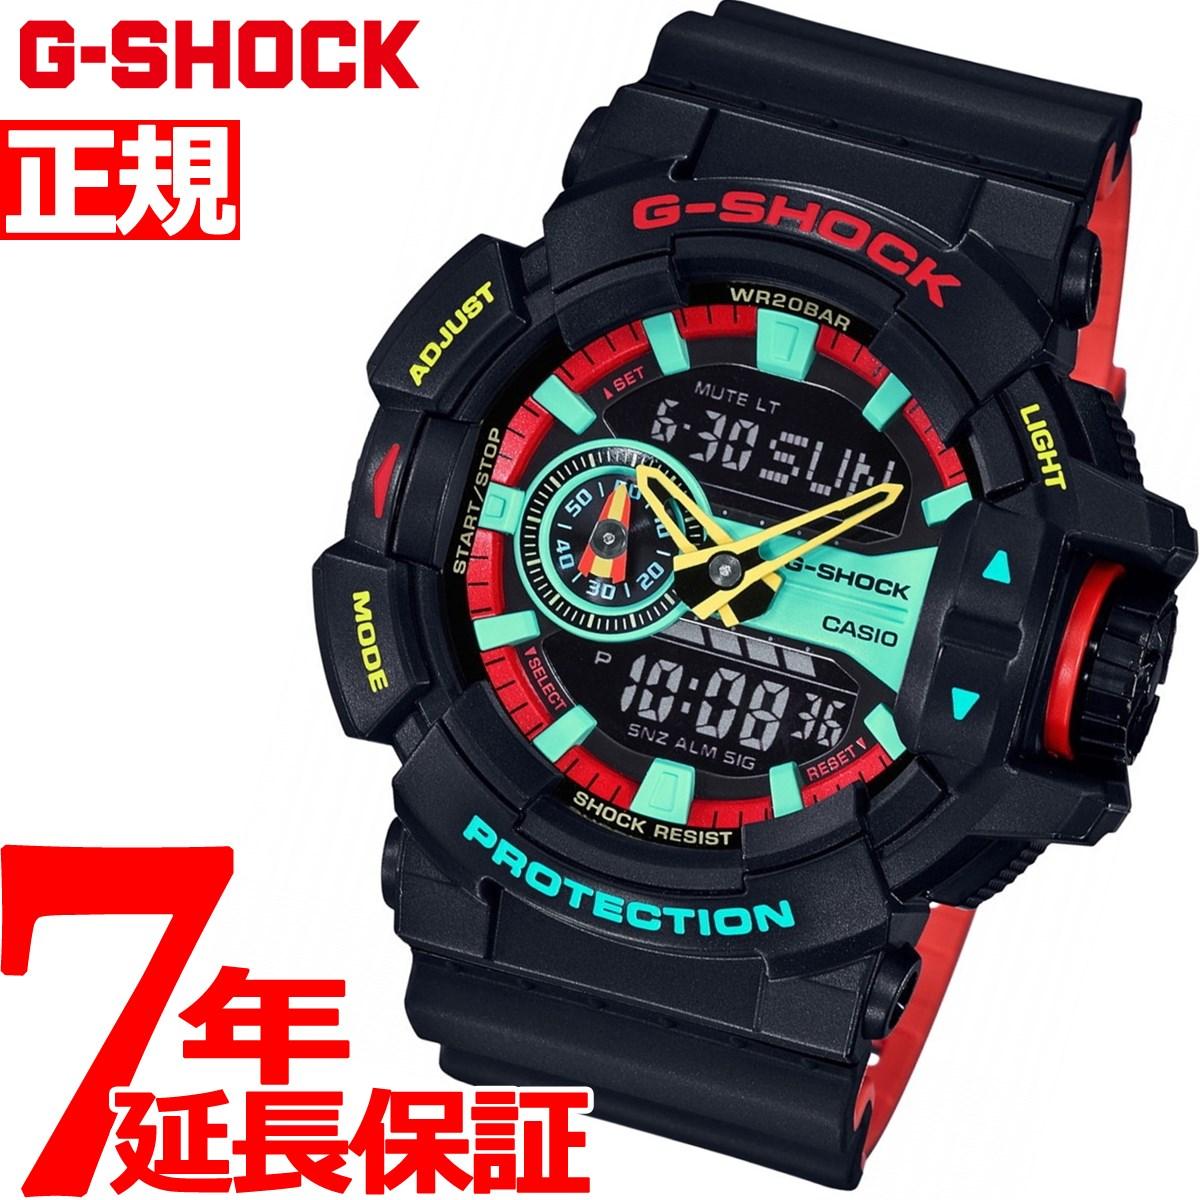 G-SHOCK デジタル カシオ Gショック CASIO 限定モデル 腕時計 メンズ ブリージー ラスタカラー Breezy Rasta Color GA-400CM-1AJF【2018 新作】